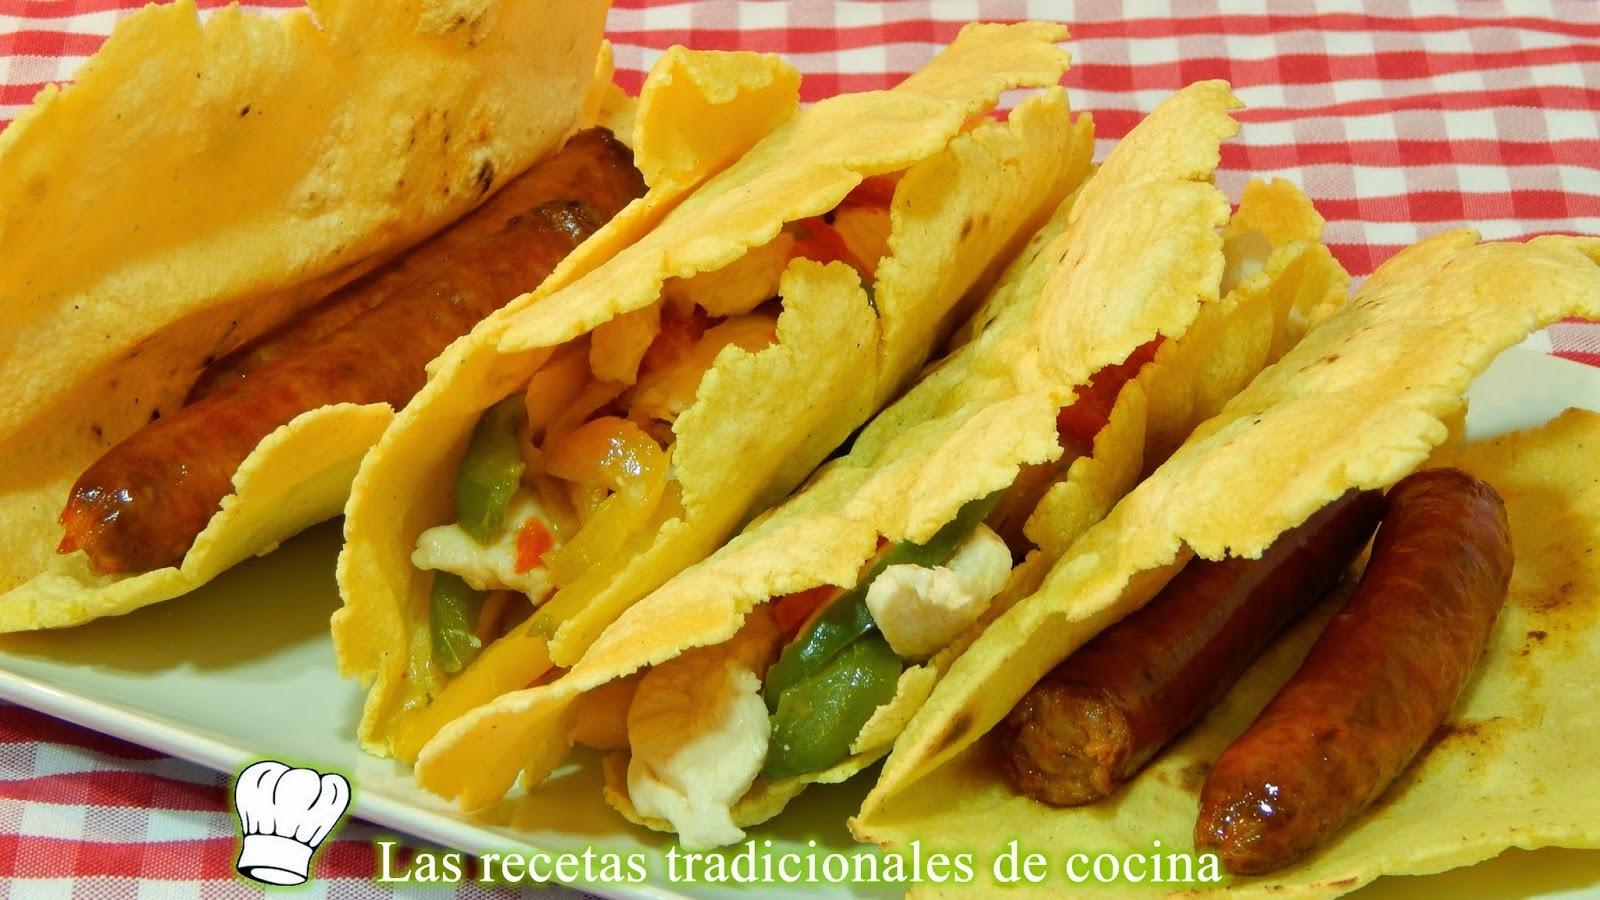 Receta de talos con chistorra o tortitas de maíz